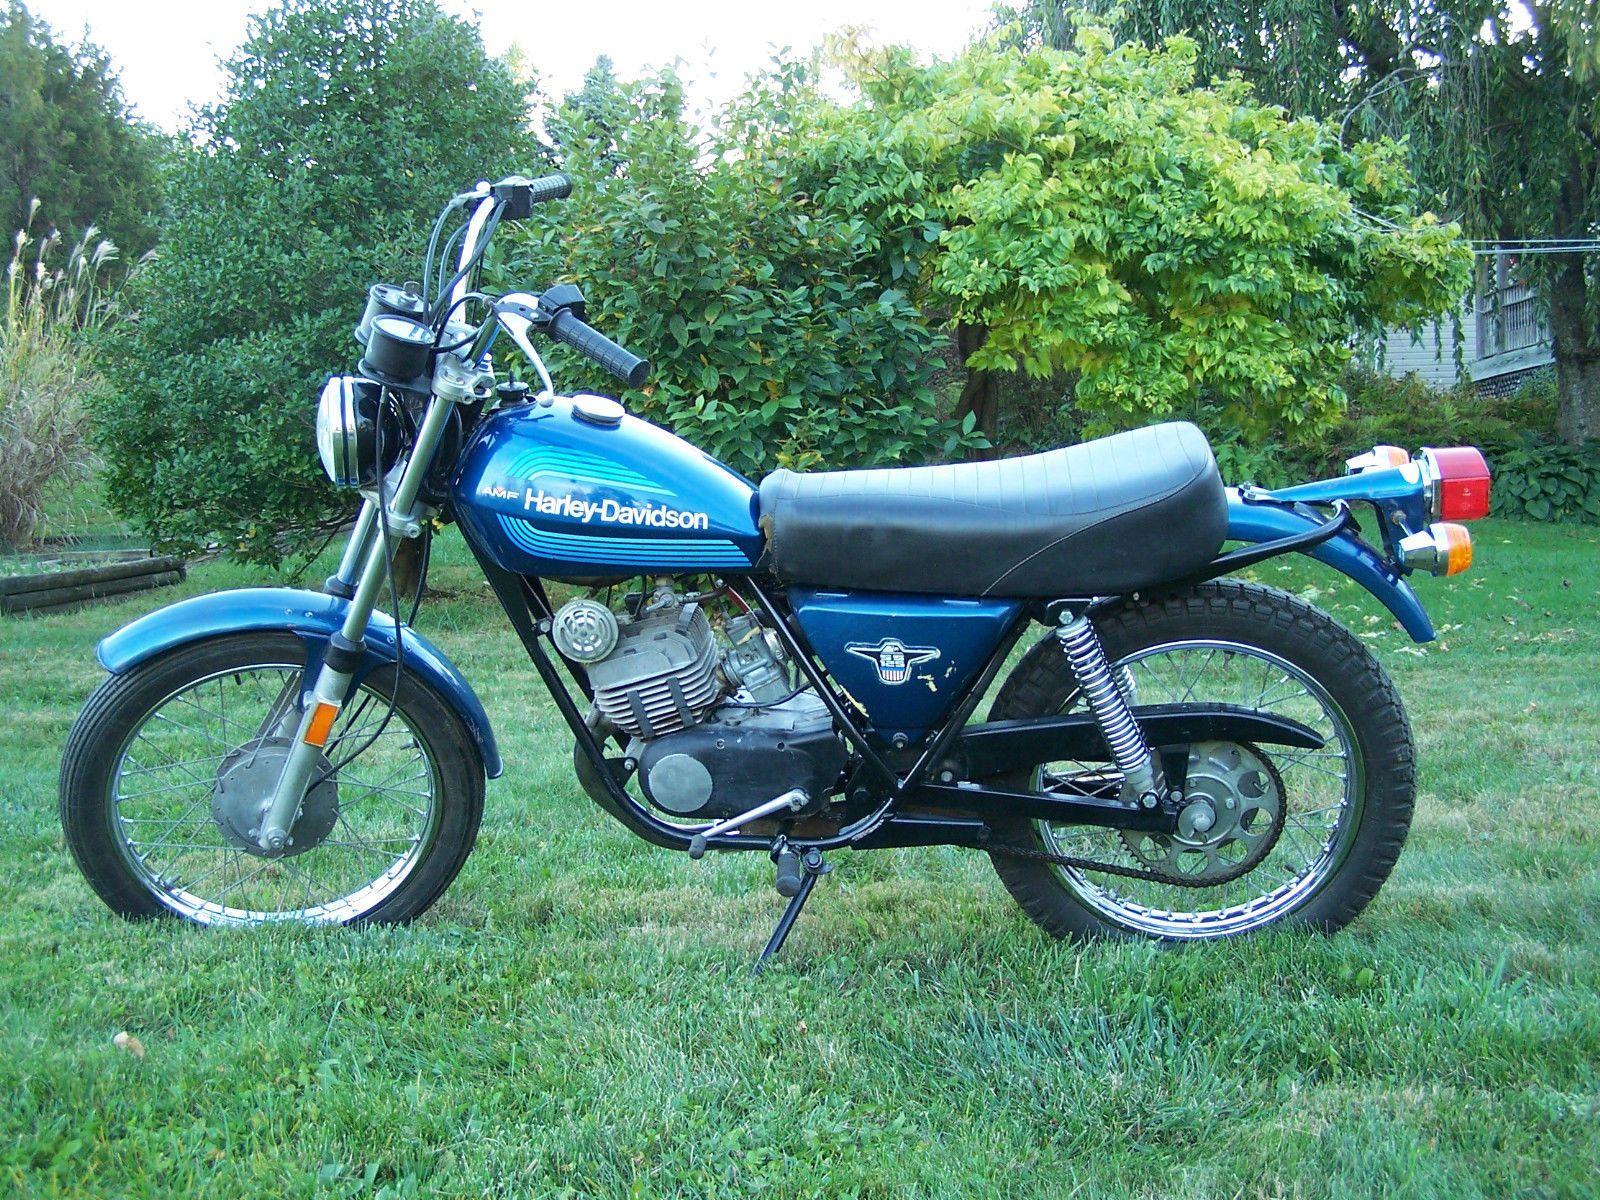 1976 Harley Davidson Aermacchi AMF SS 125